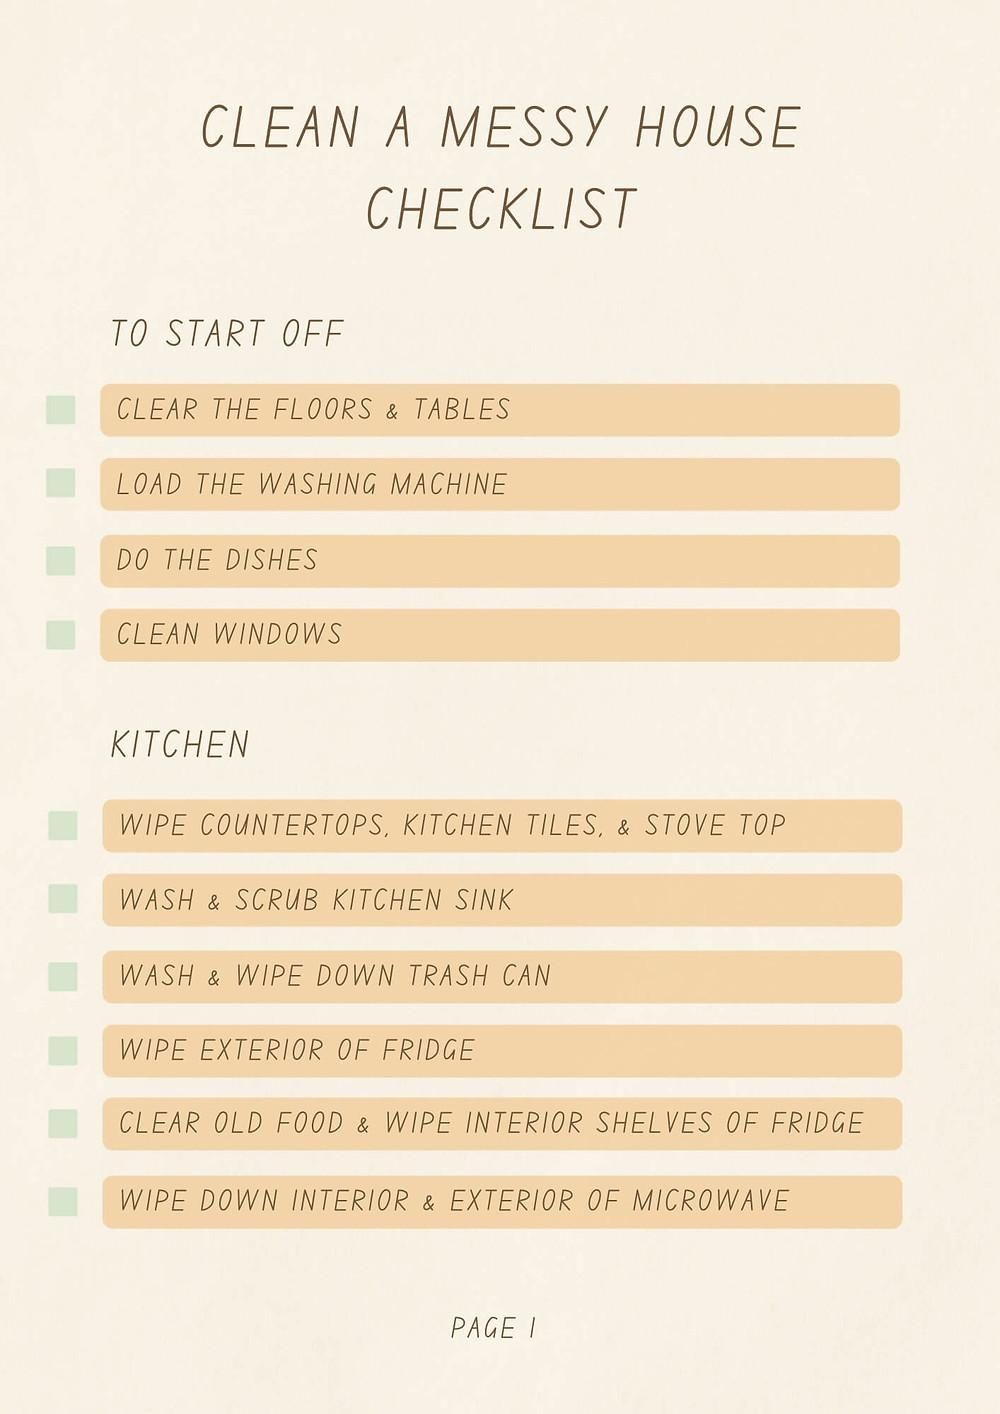 clean a messy house checklist